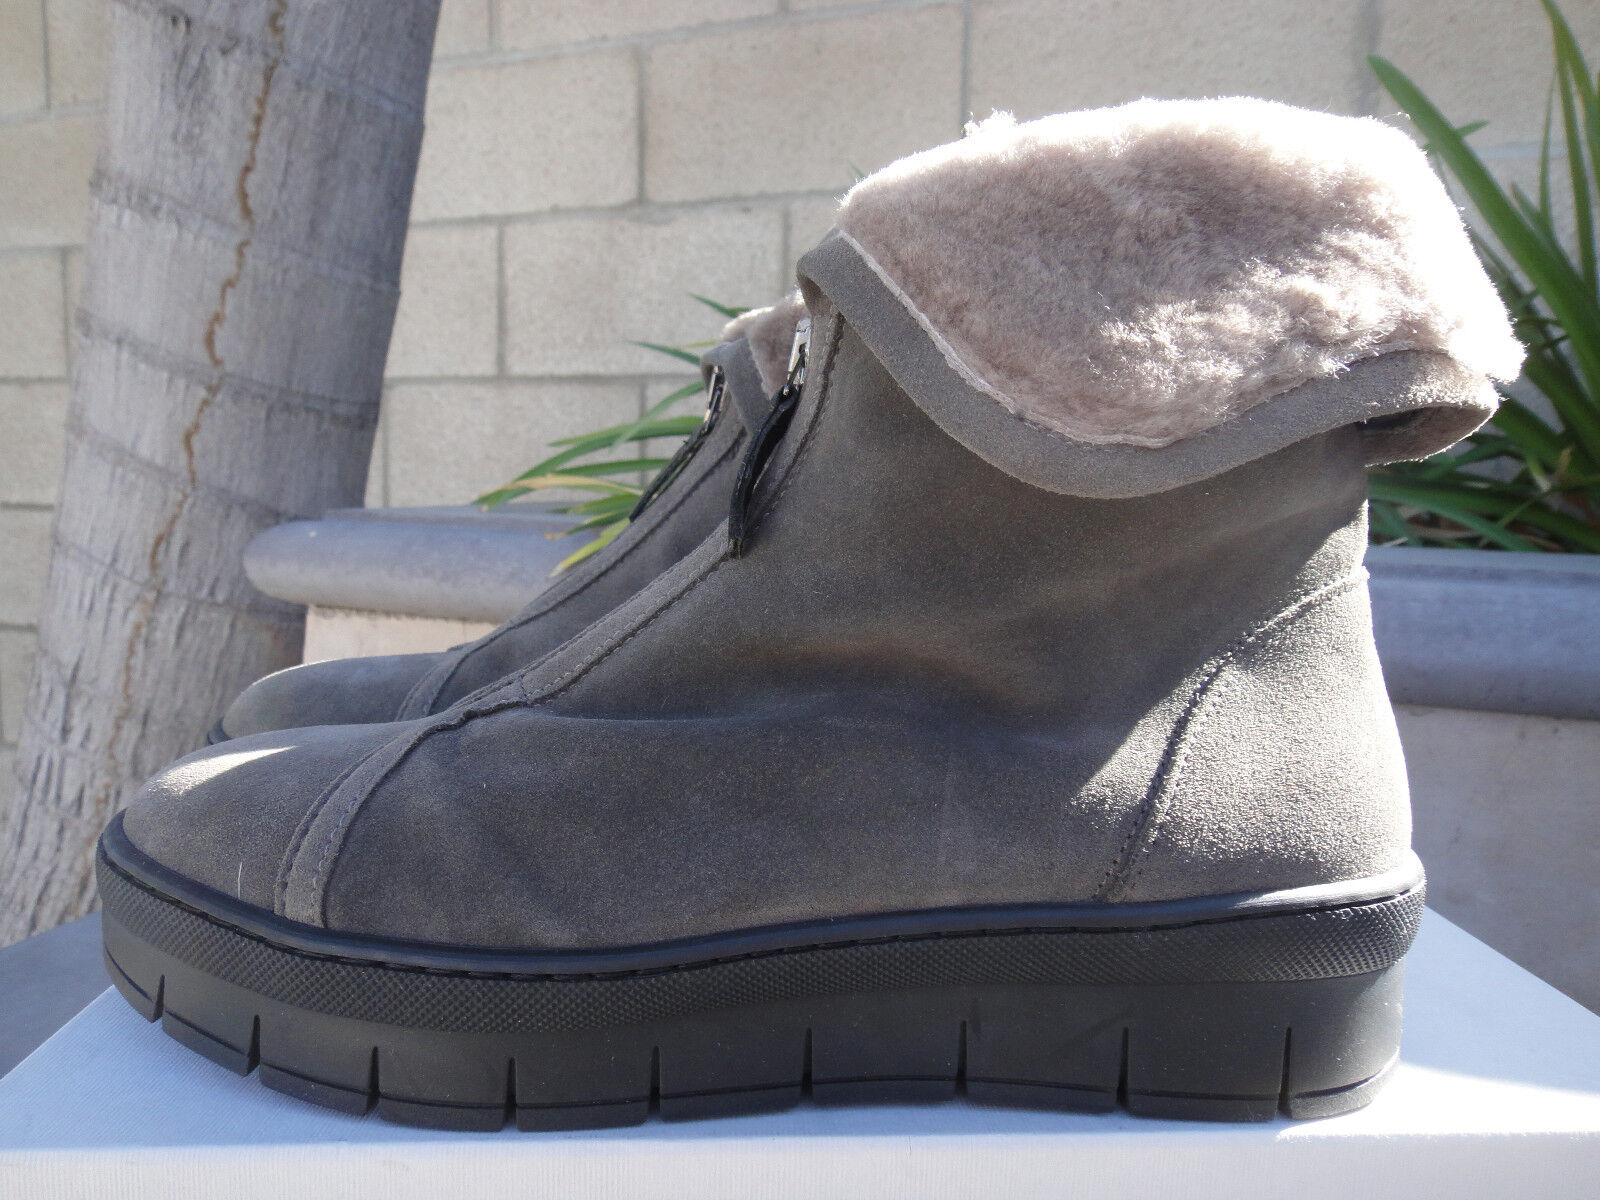 lo stile classico Cordani PHILLIPS G16108 G16108 G16108 Suede Ankle avvio avvioie, Donna  Sz EUR38, MSRP  380  vendite calde